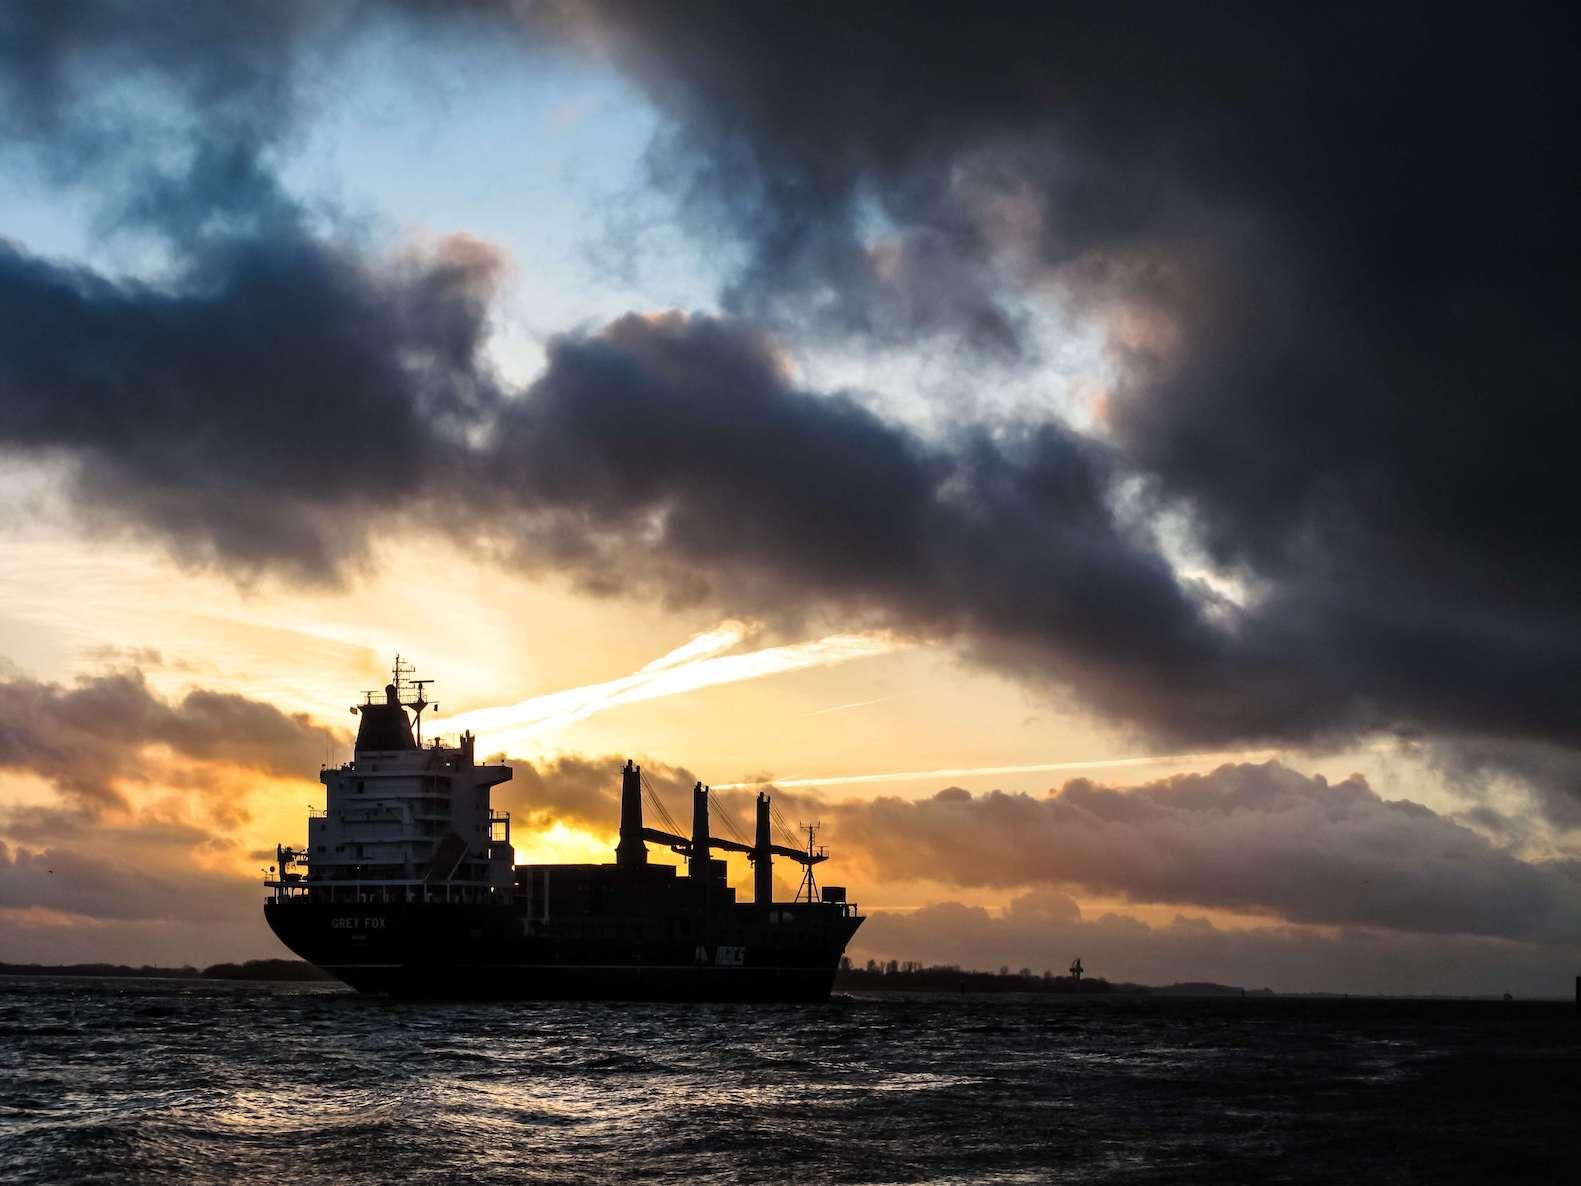 Slow steaming vessel at the ocean